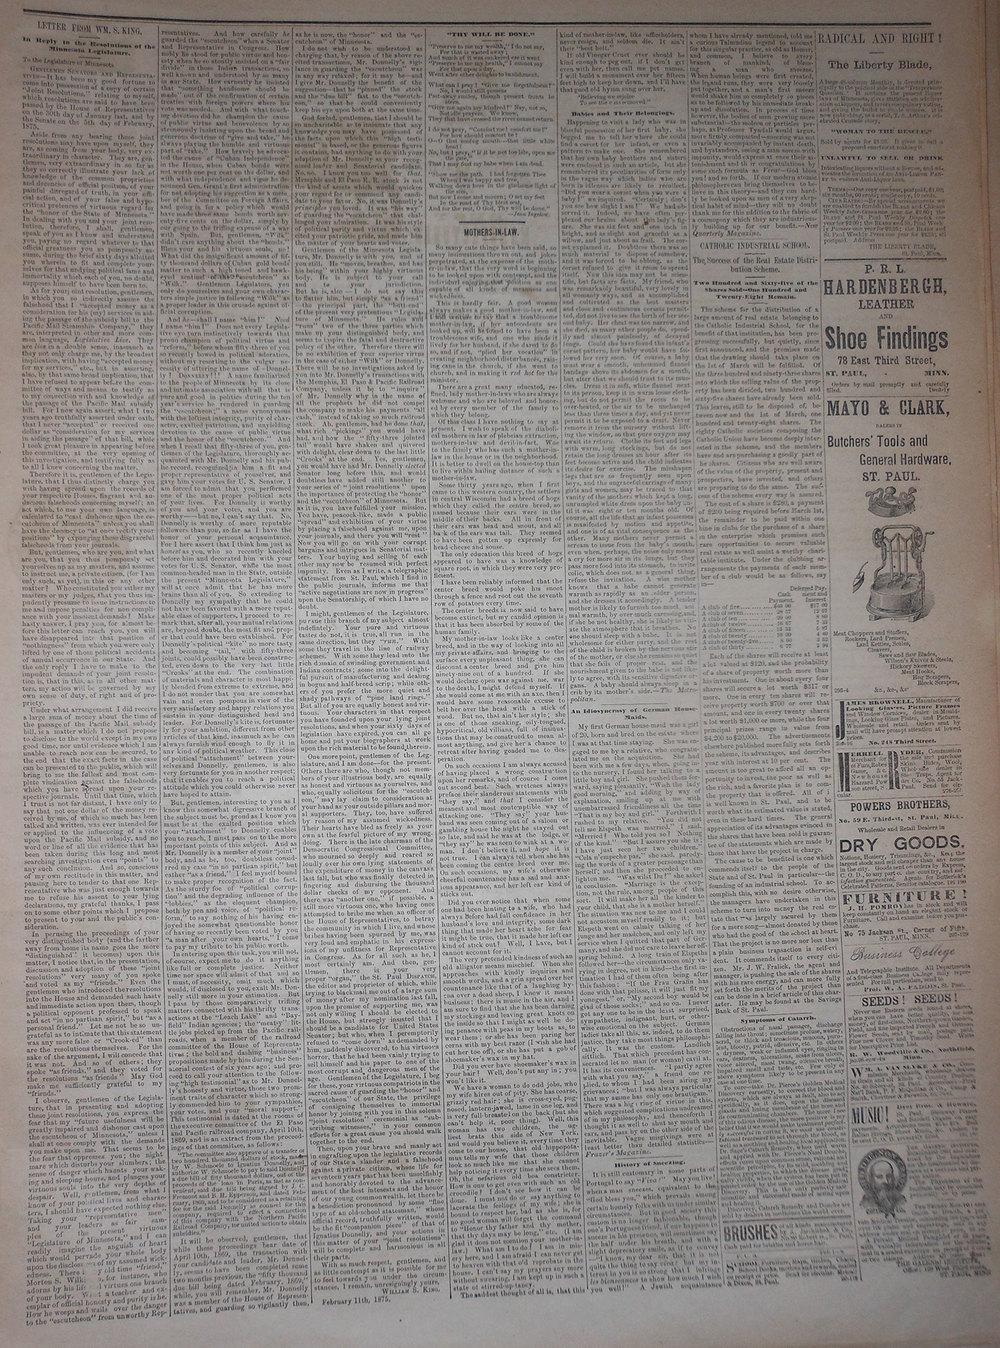 2/24/1875, p3